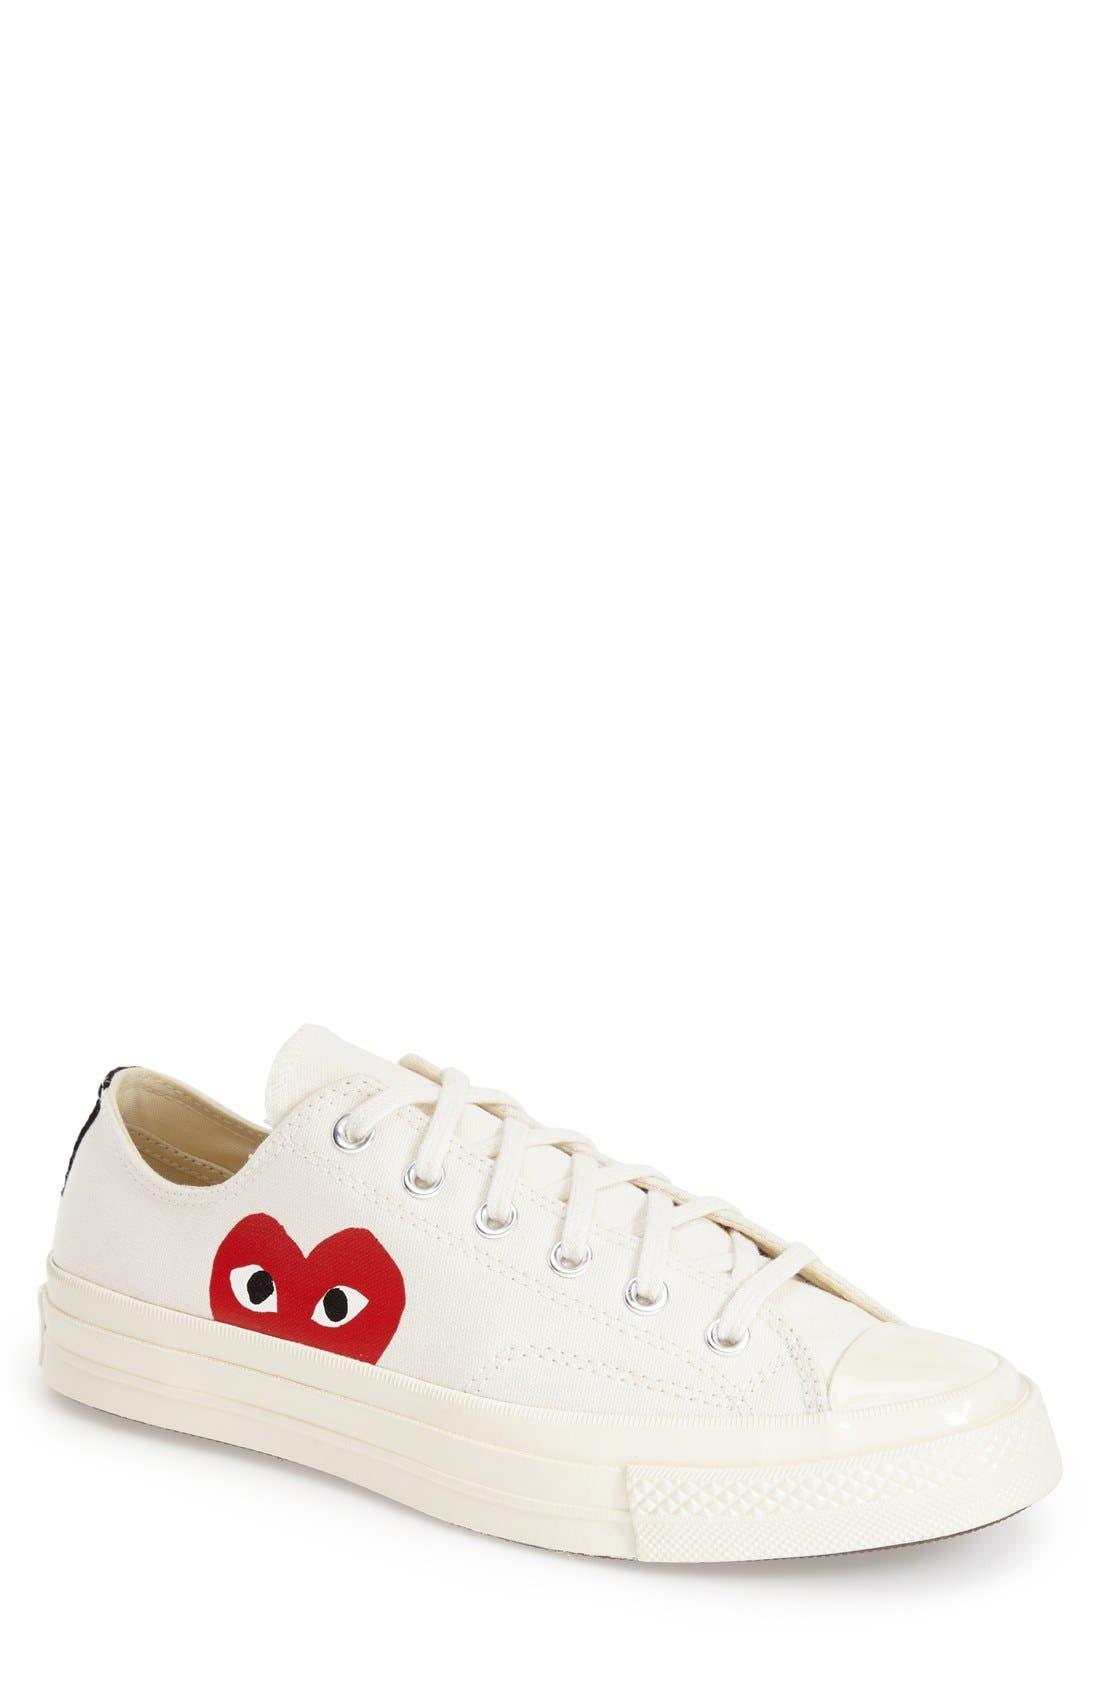 Alternate Image 1 Selected - Comme des Garçons PLAY x Converse Chuck Taylor® Low Top Sneaker (Men)